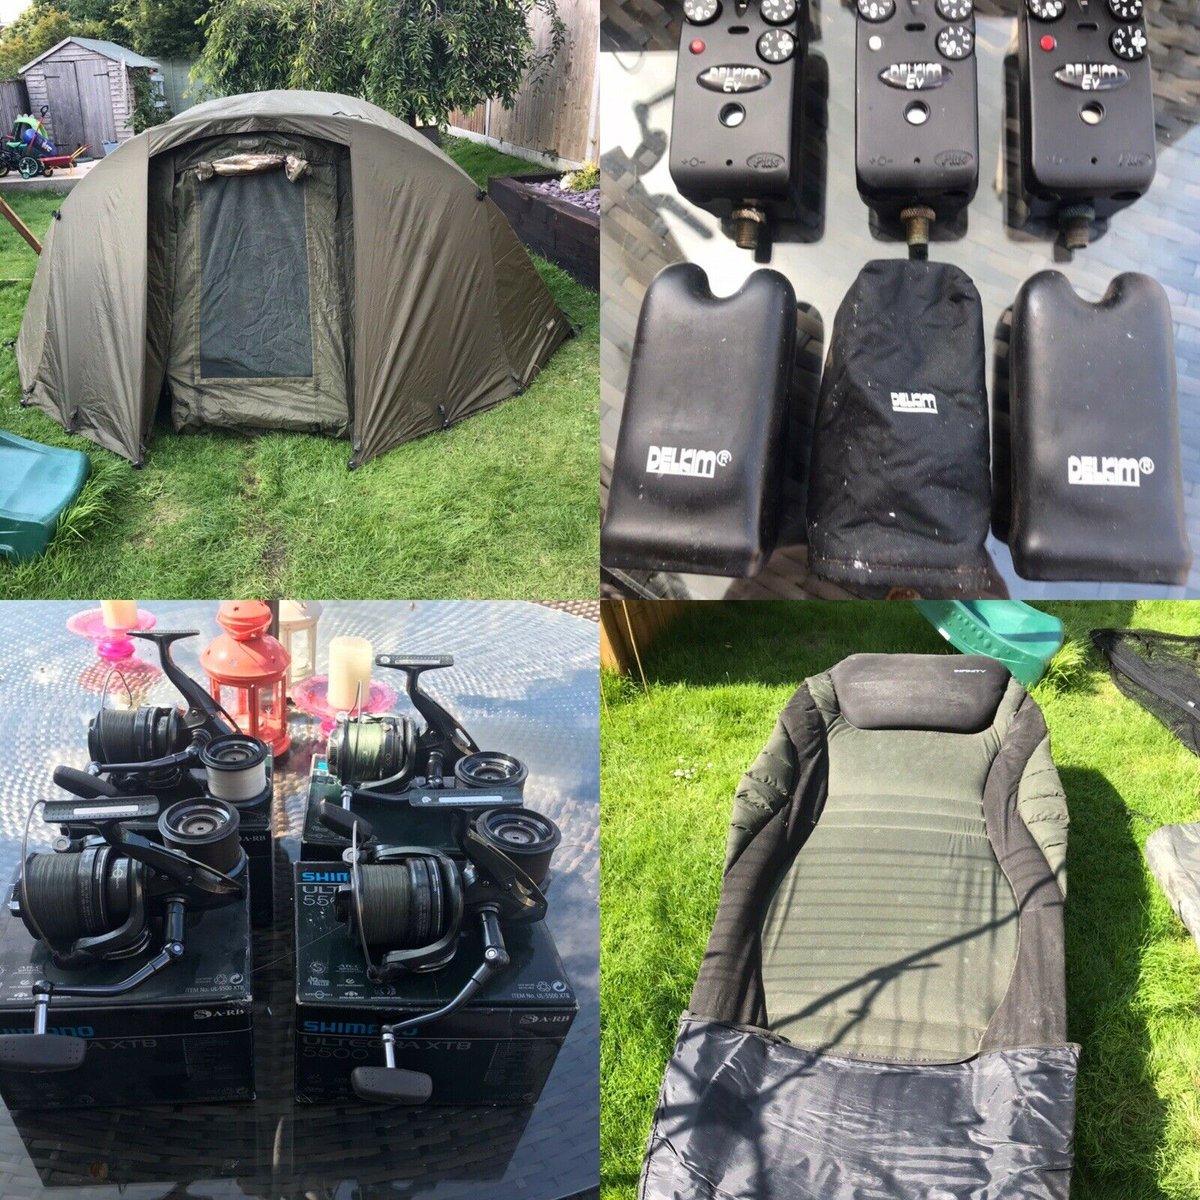 Ad - Carp Fishing Set Up Job Lot For Sale On eBay here -->> https://t.co/E8OC1GeAEP  #carpfish